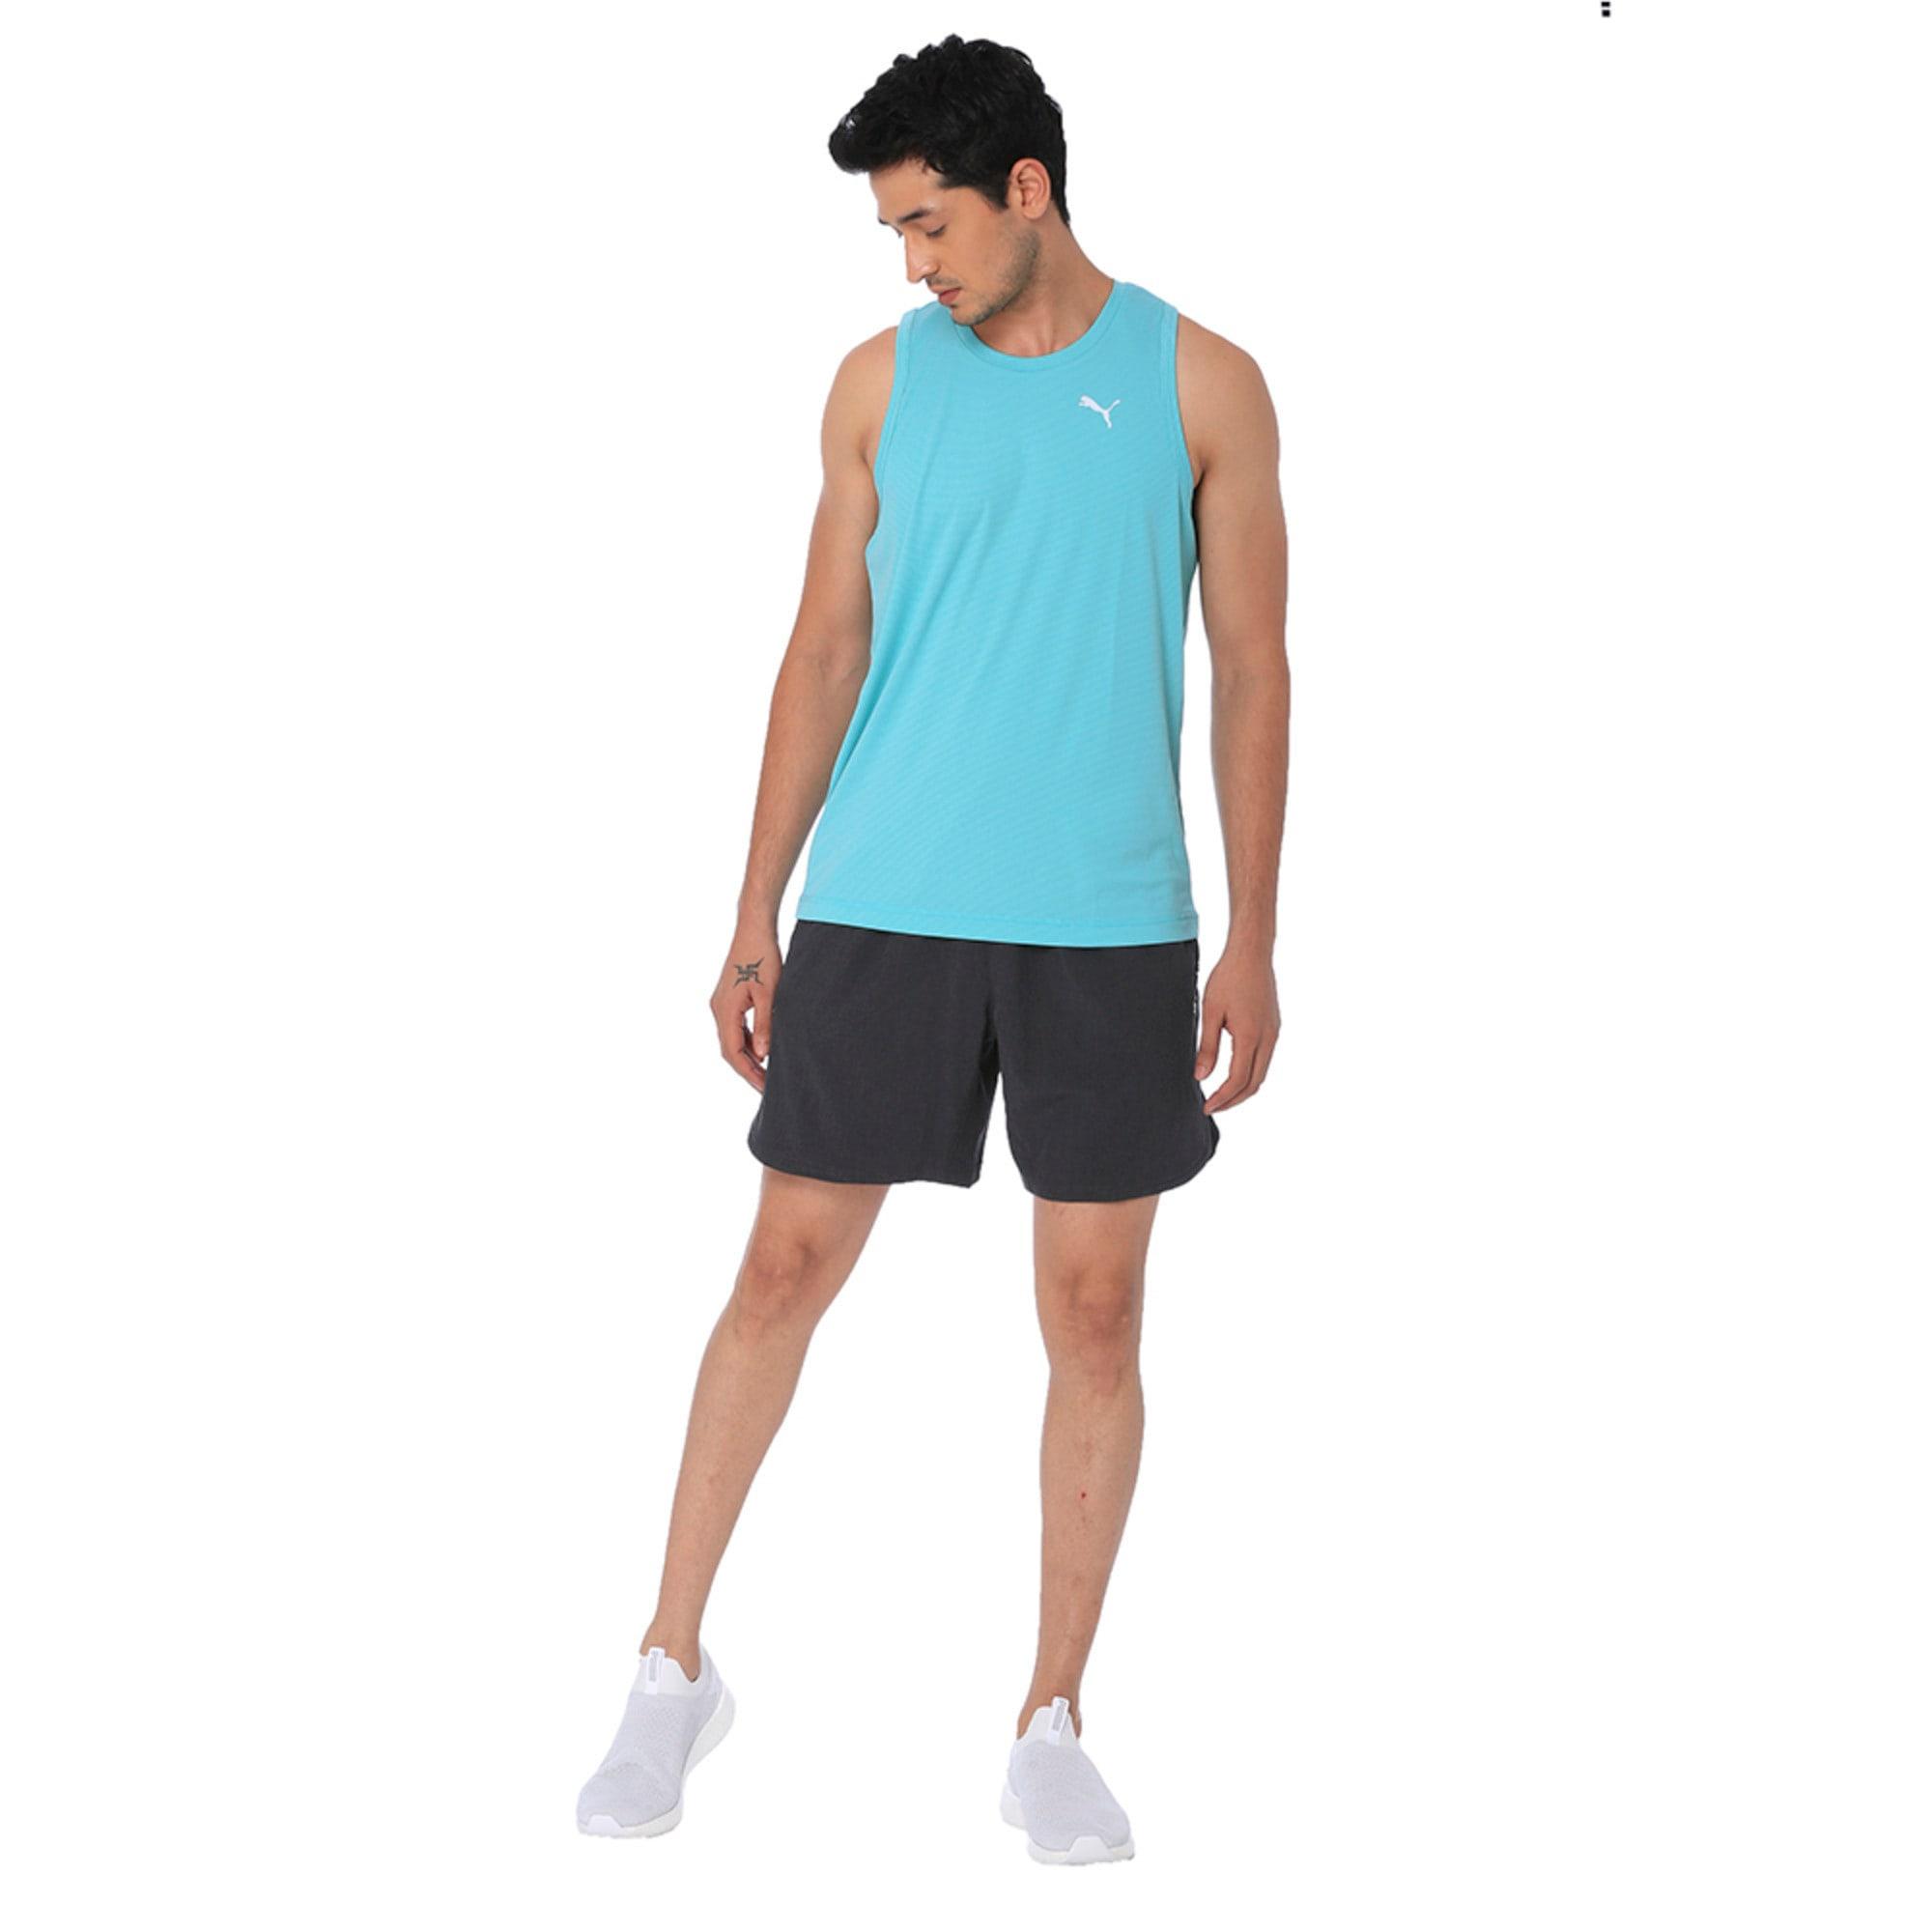 Thumbnail 1 of one8 VK Active Men's Singlet Tee, Blue Turquoise Heather, medium-IND